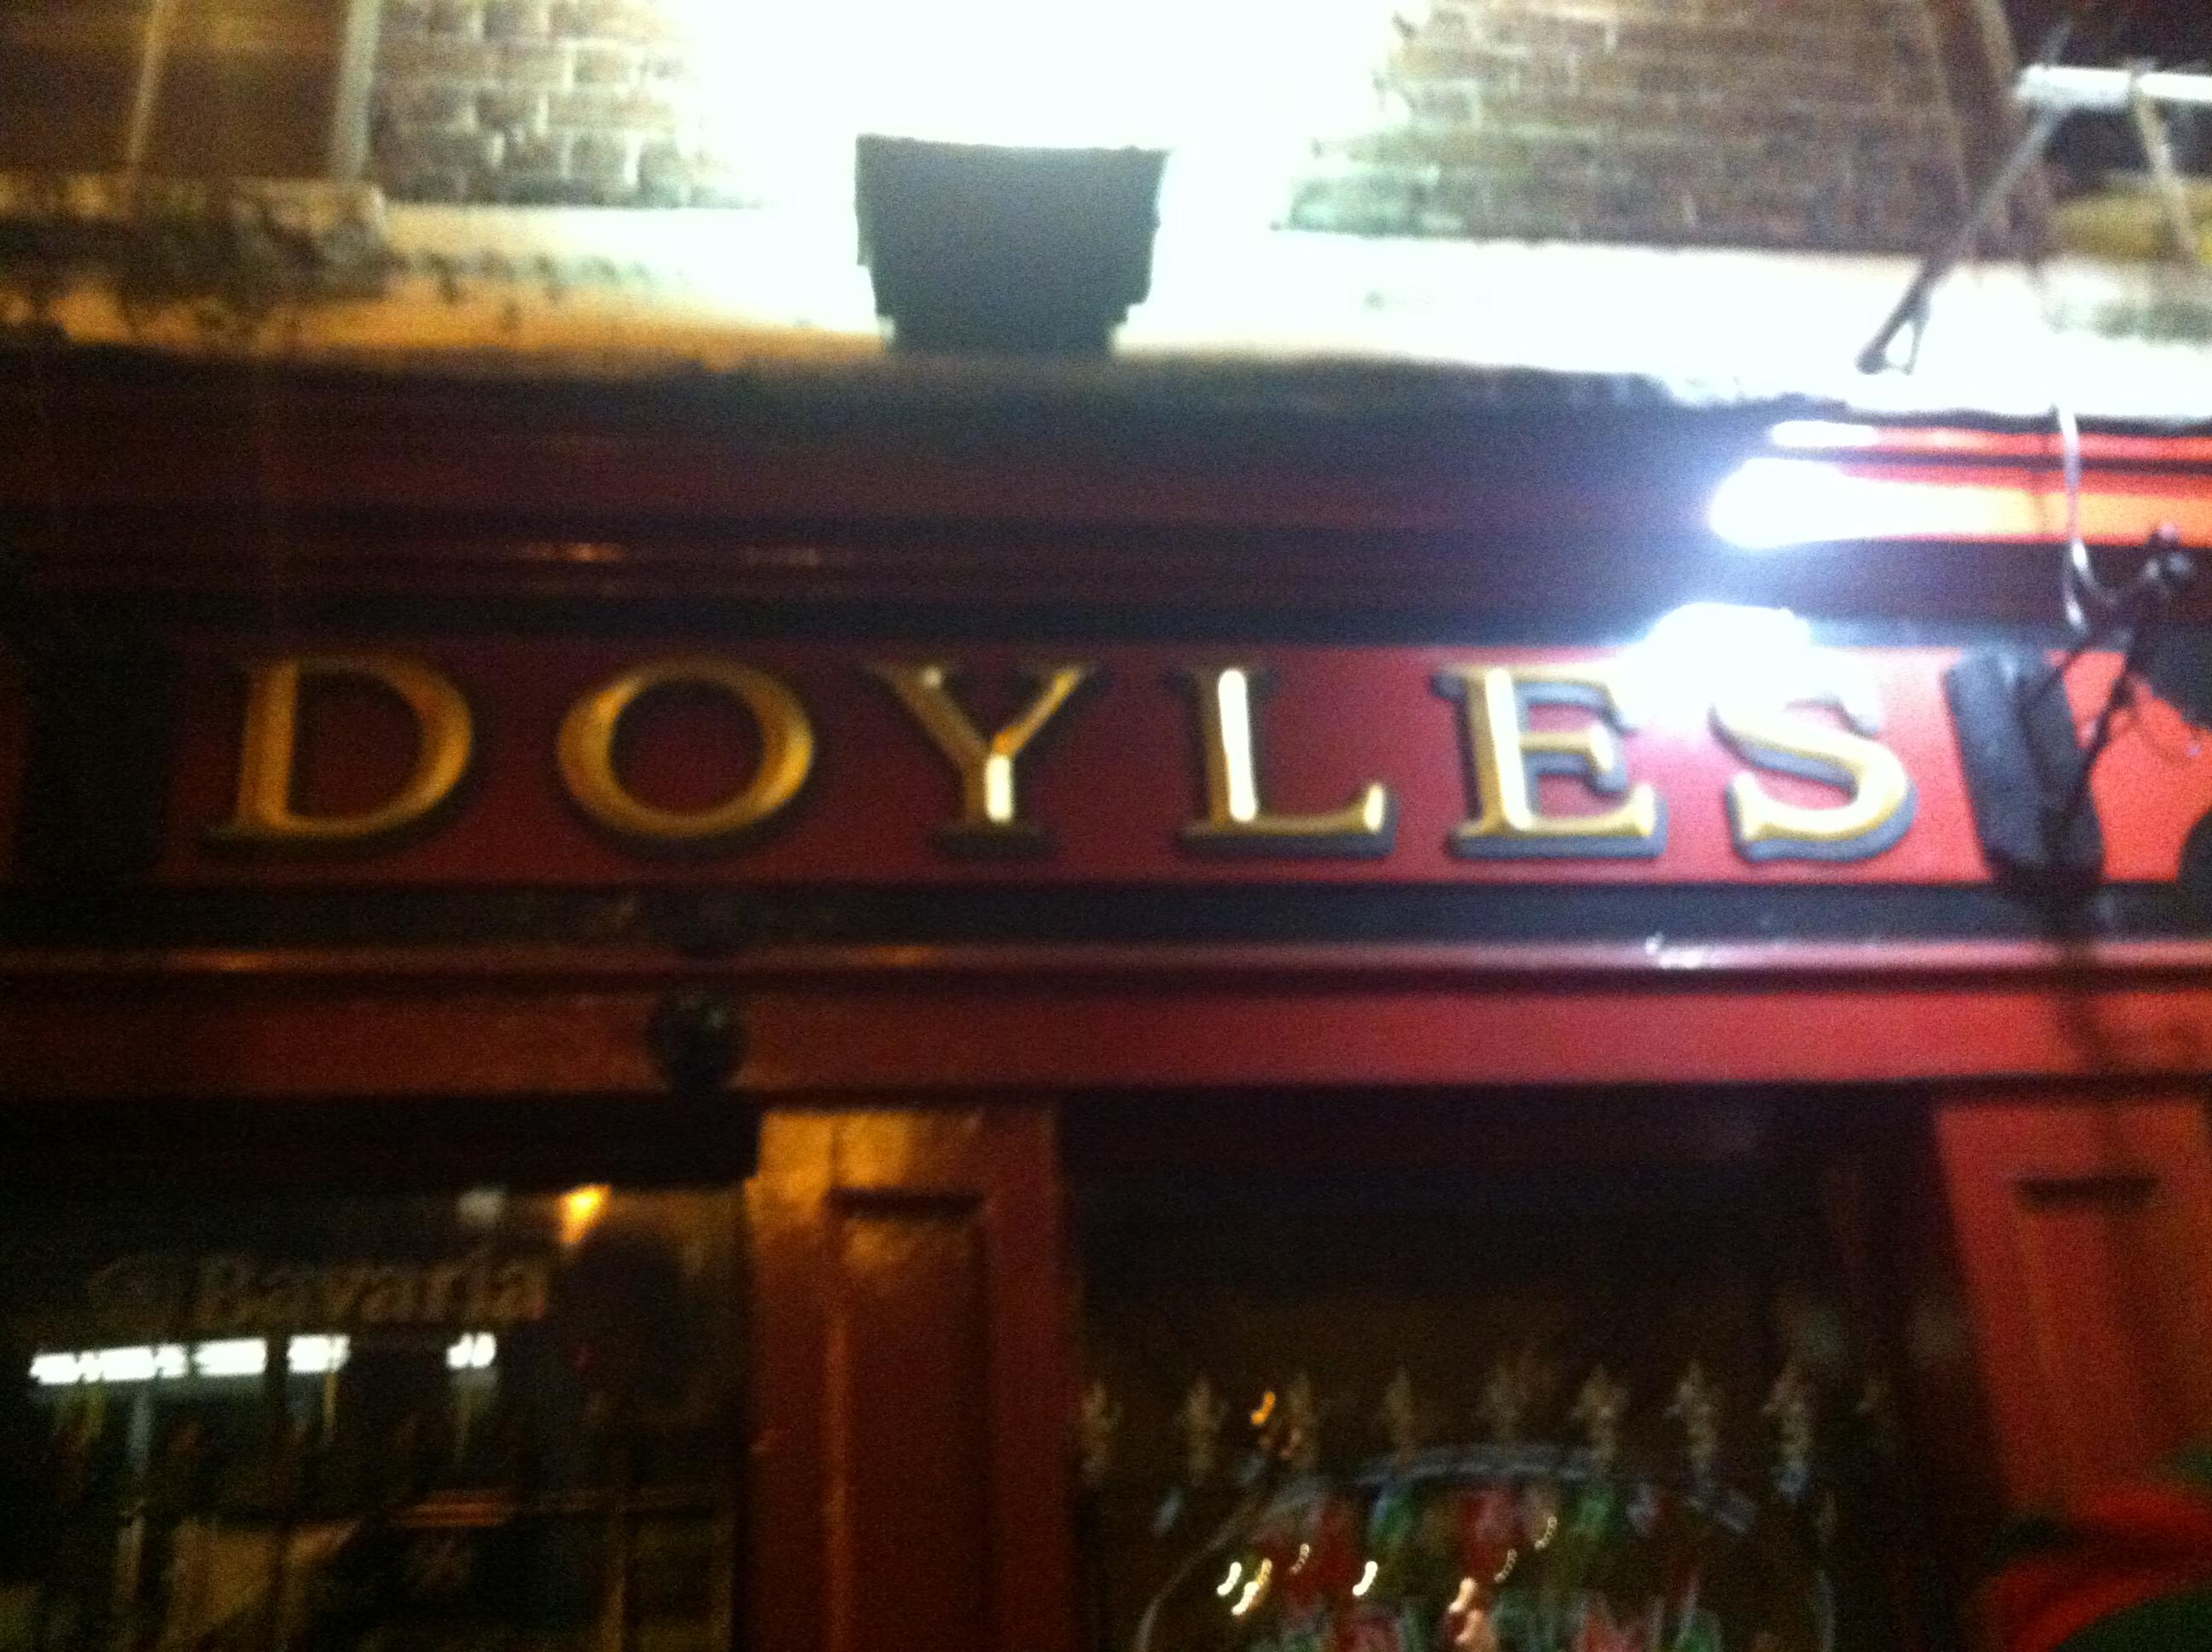 Doyles pub on college st.